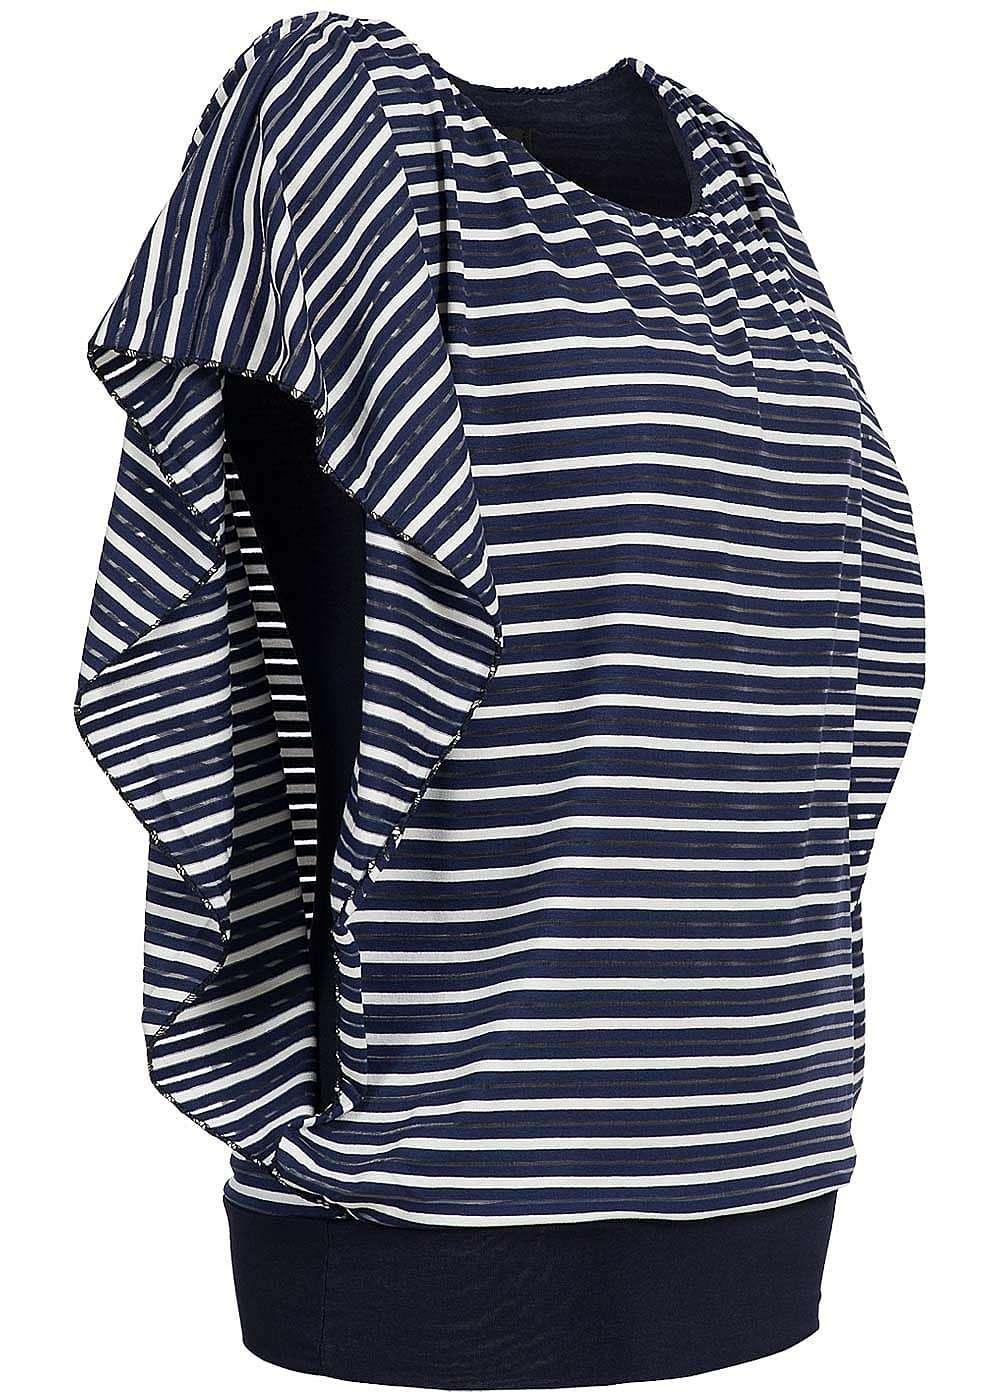 styleboom fashion damen 2in1 shirt u boot ausschnitt. Black Bedroom Furniture Sets. Home Design Ideas